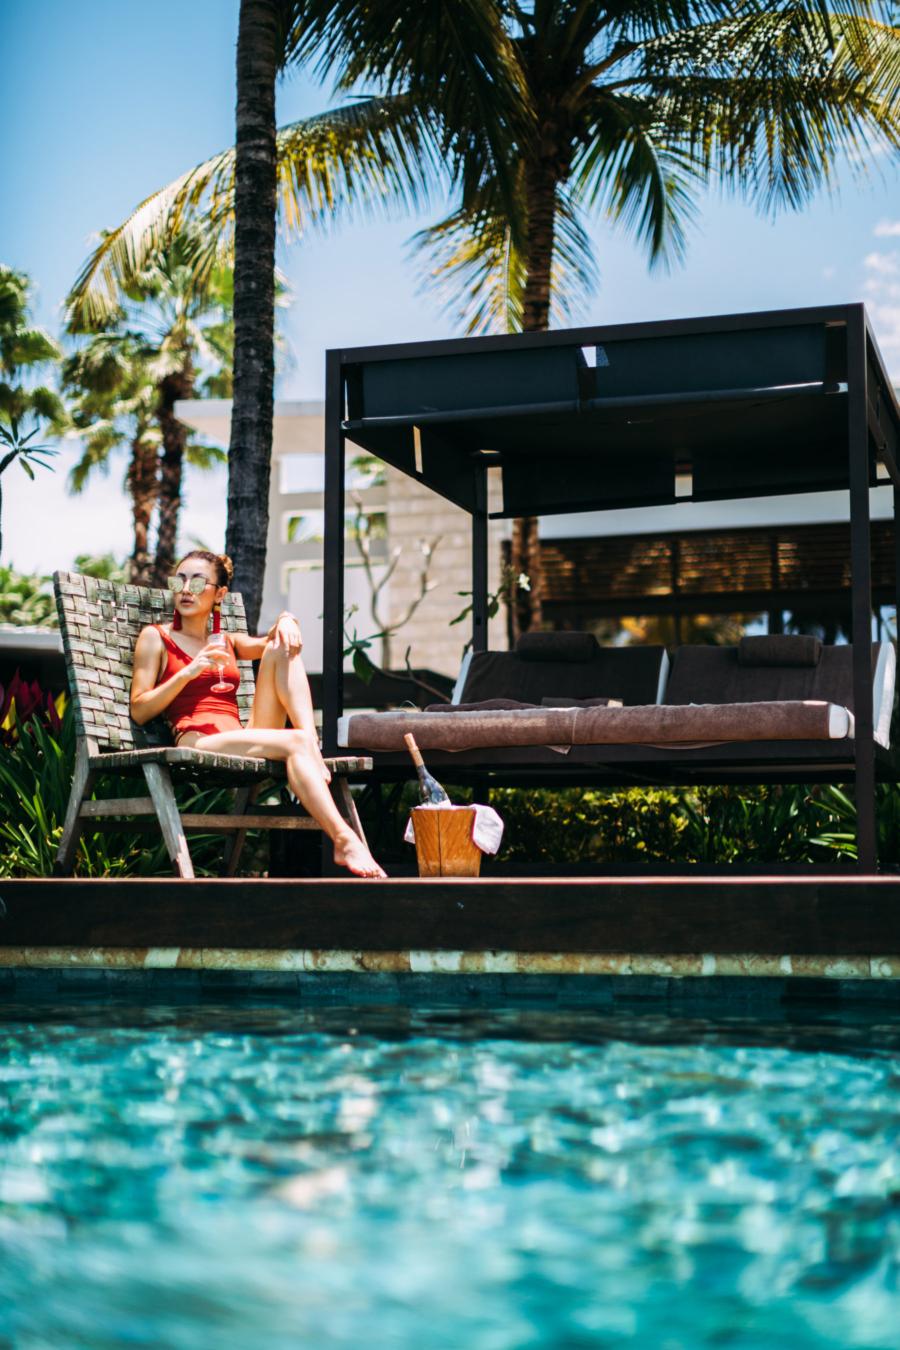 Poolside Hanging - Discover Puerto Rico's Best Kept Secret // NotJessFashion.com